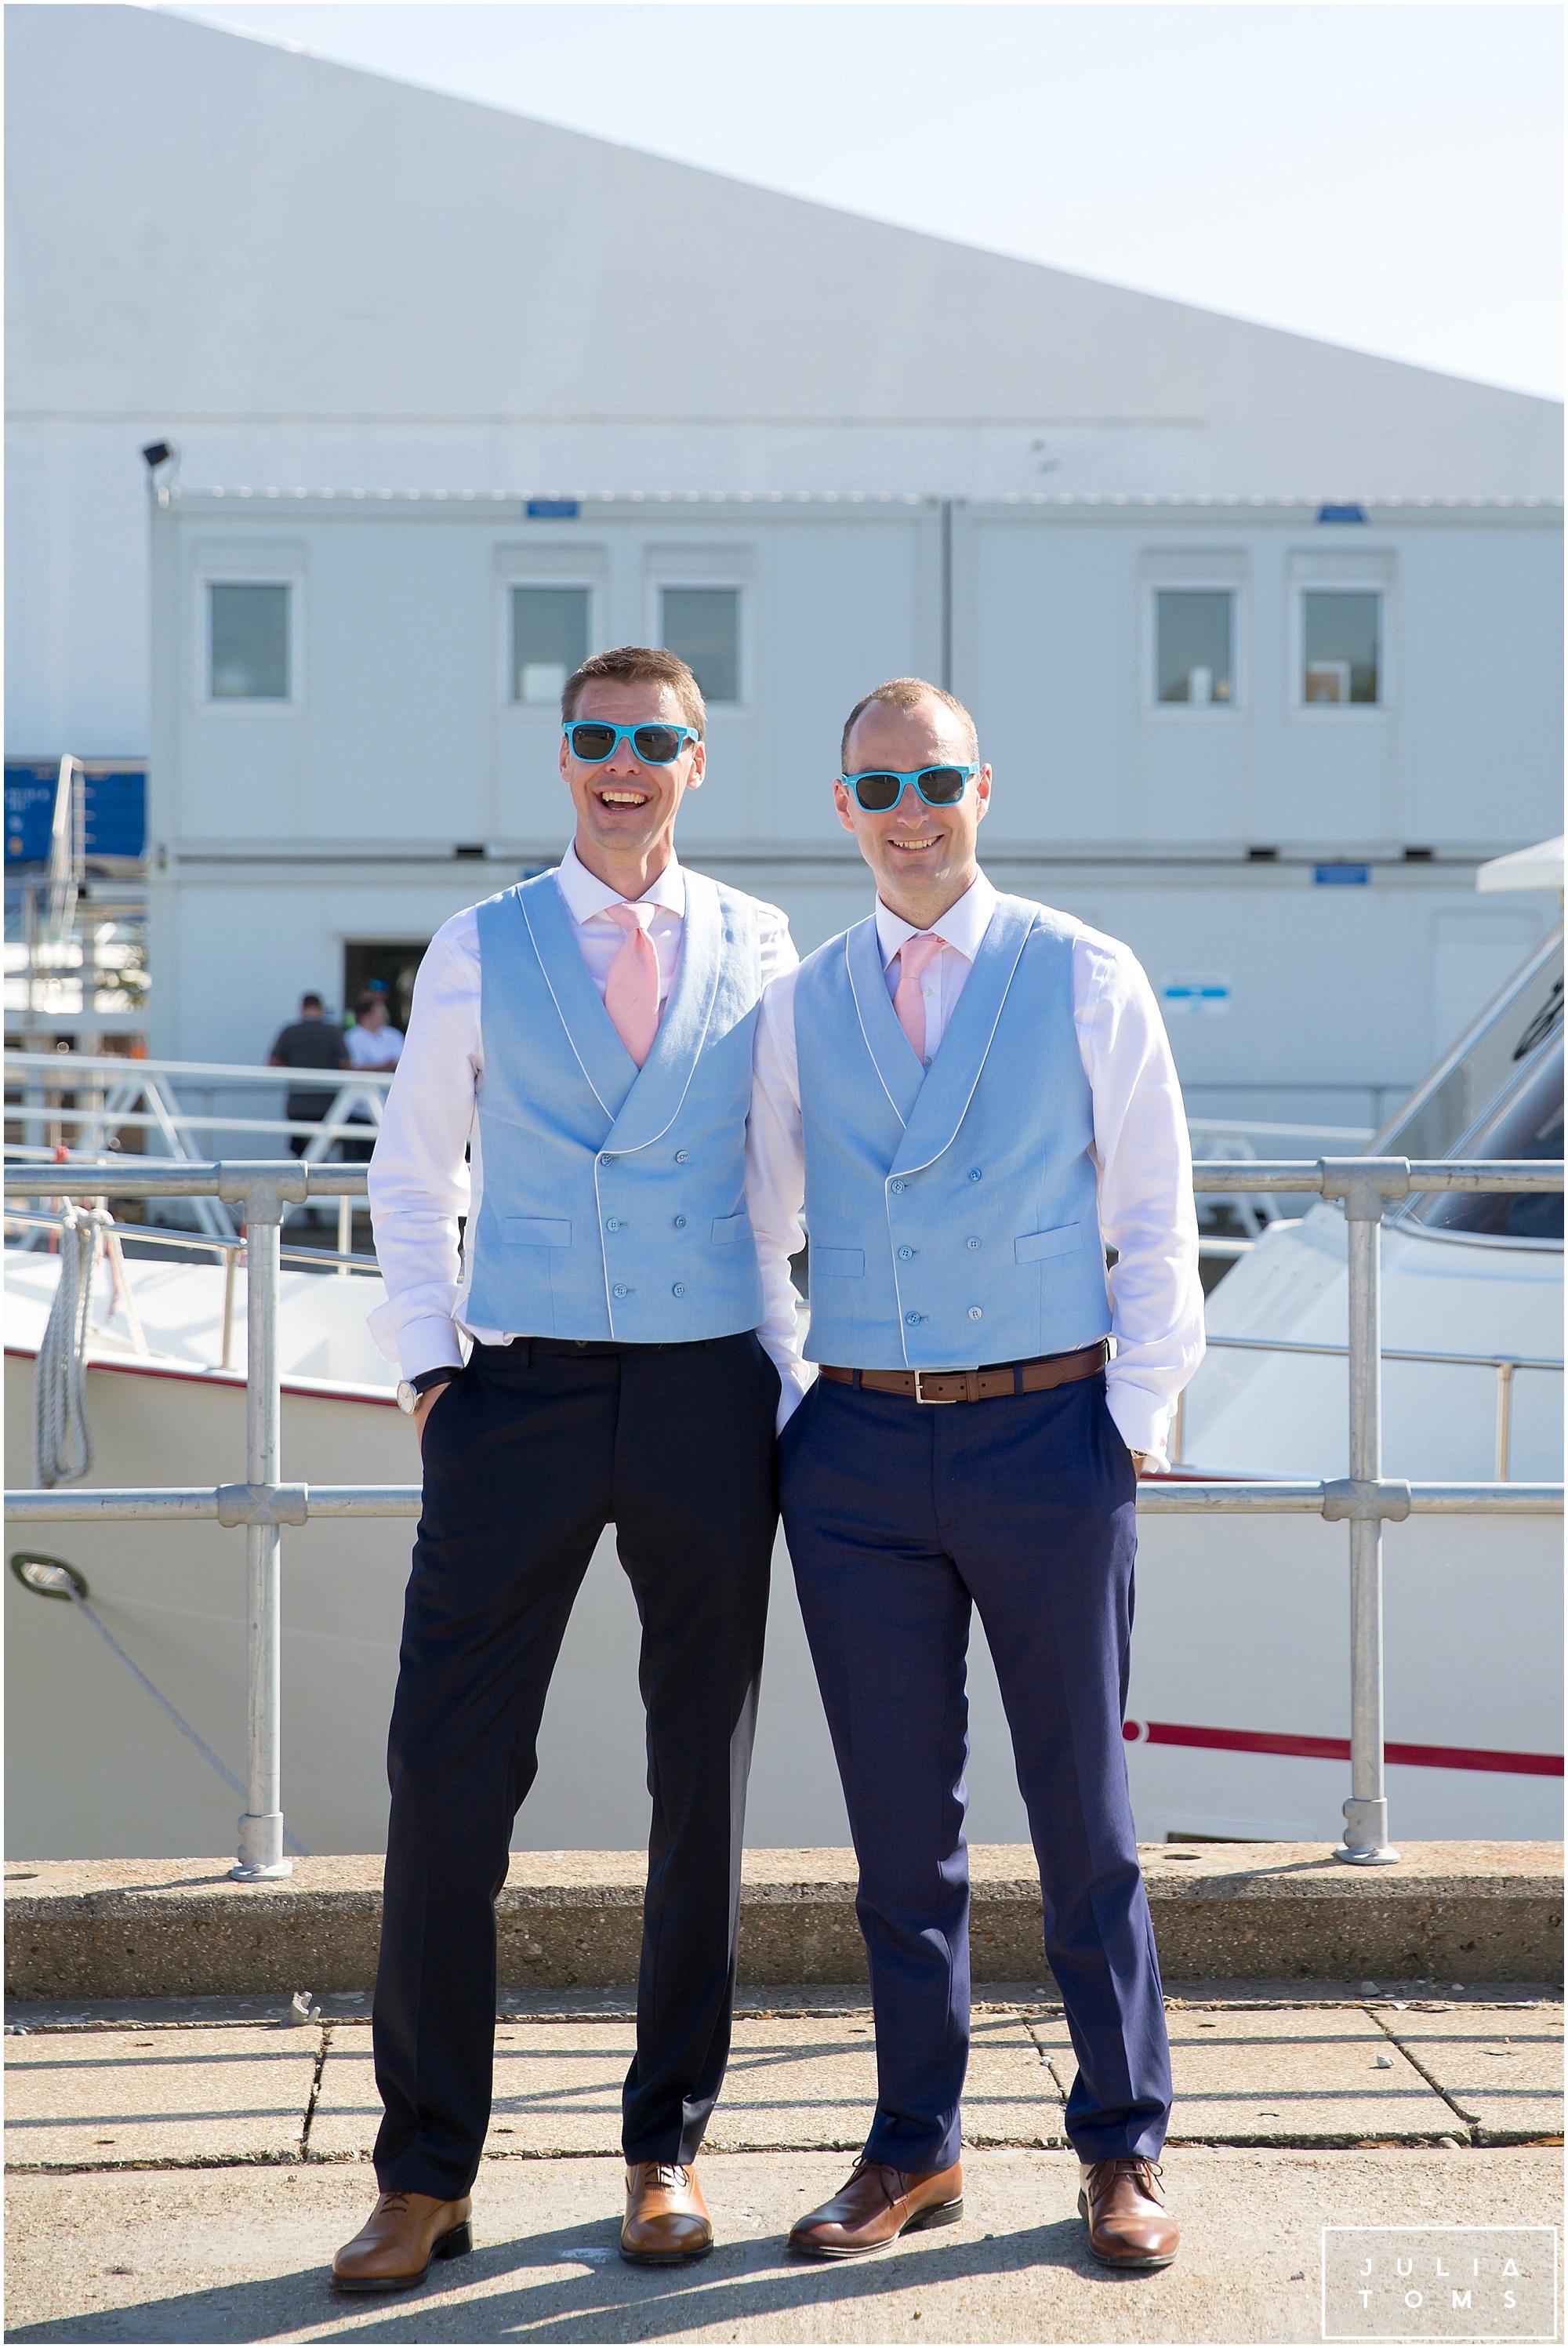 julia_toms_chichester_wedding_photographer_portsmouth_048.jpg